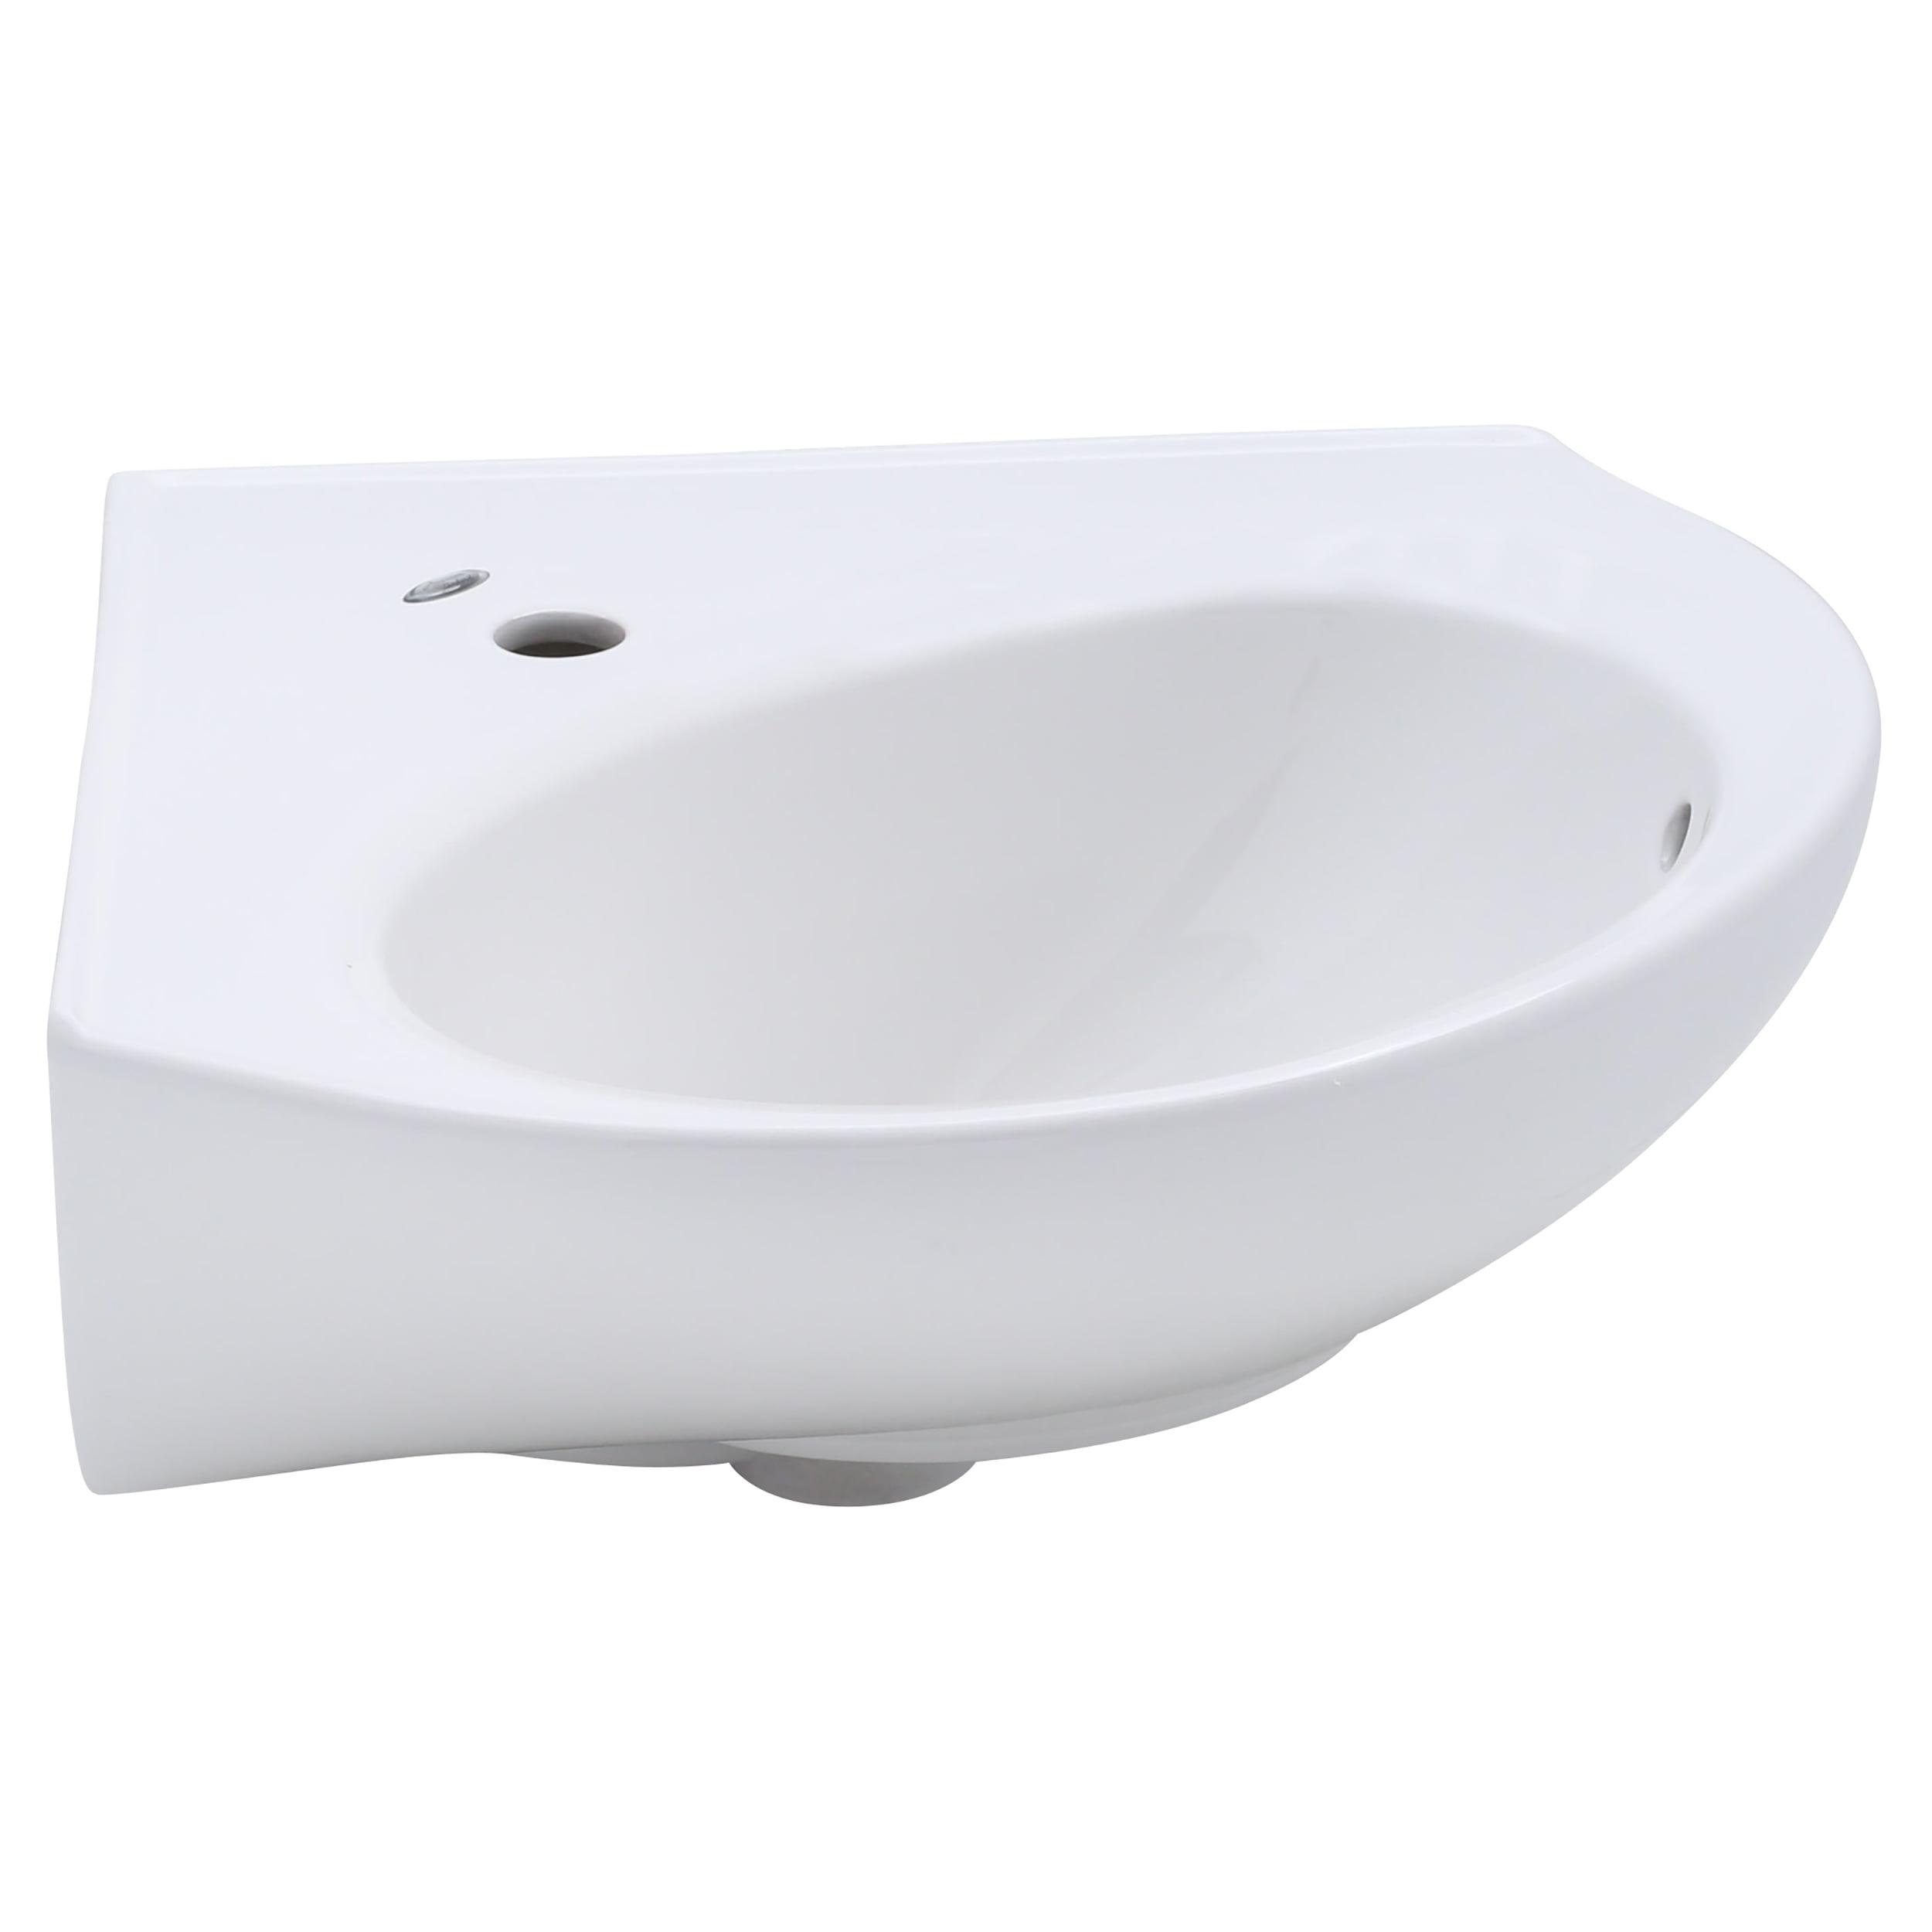 American Standard Cornice Corner Pedestal Sink Top With Single Hole In White Walmart Com Walmart Com